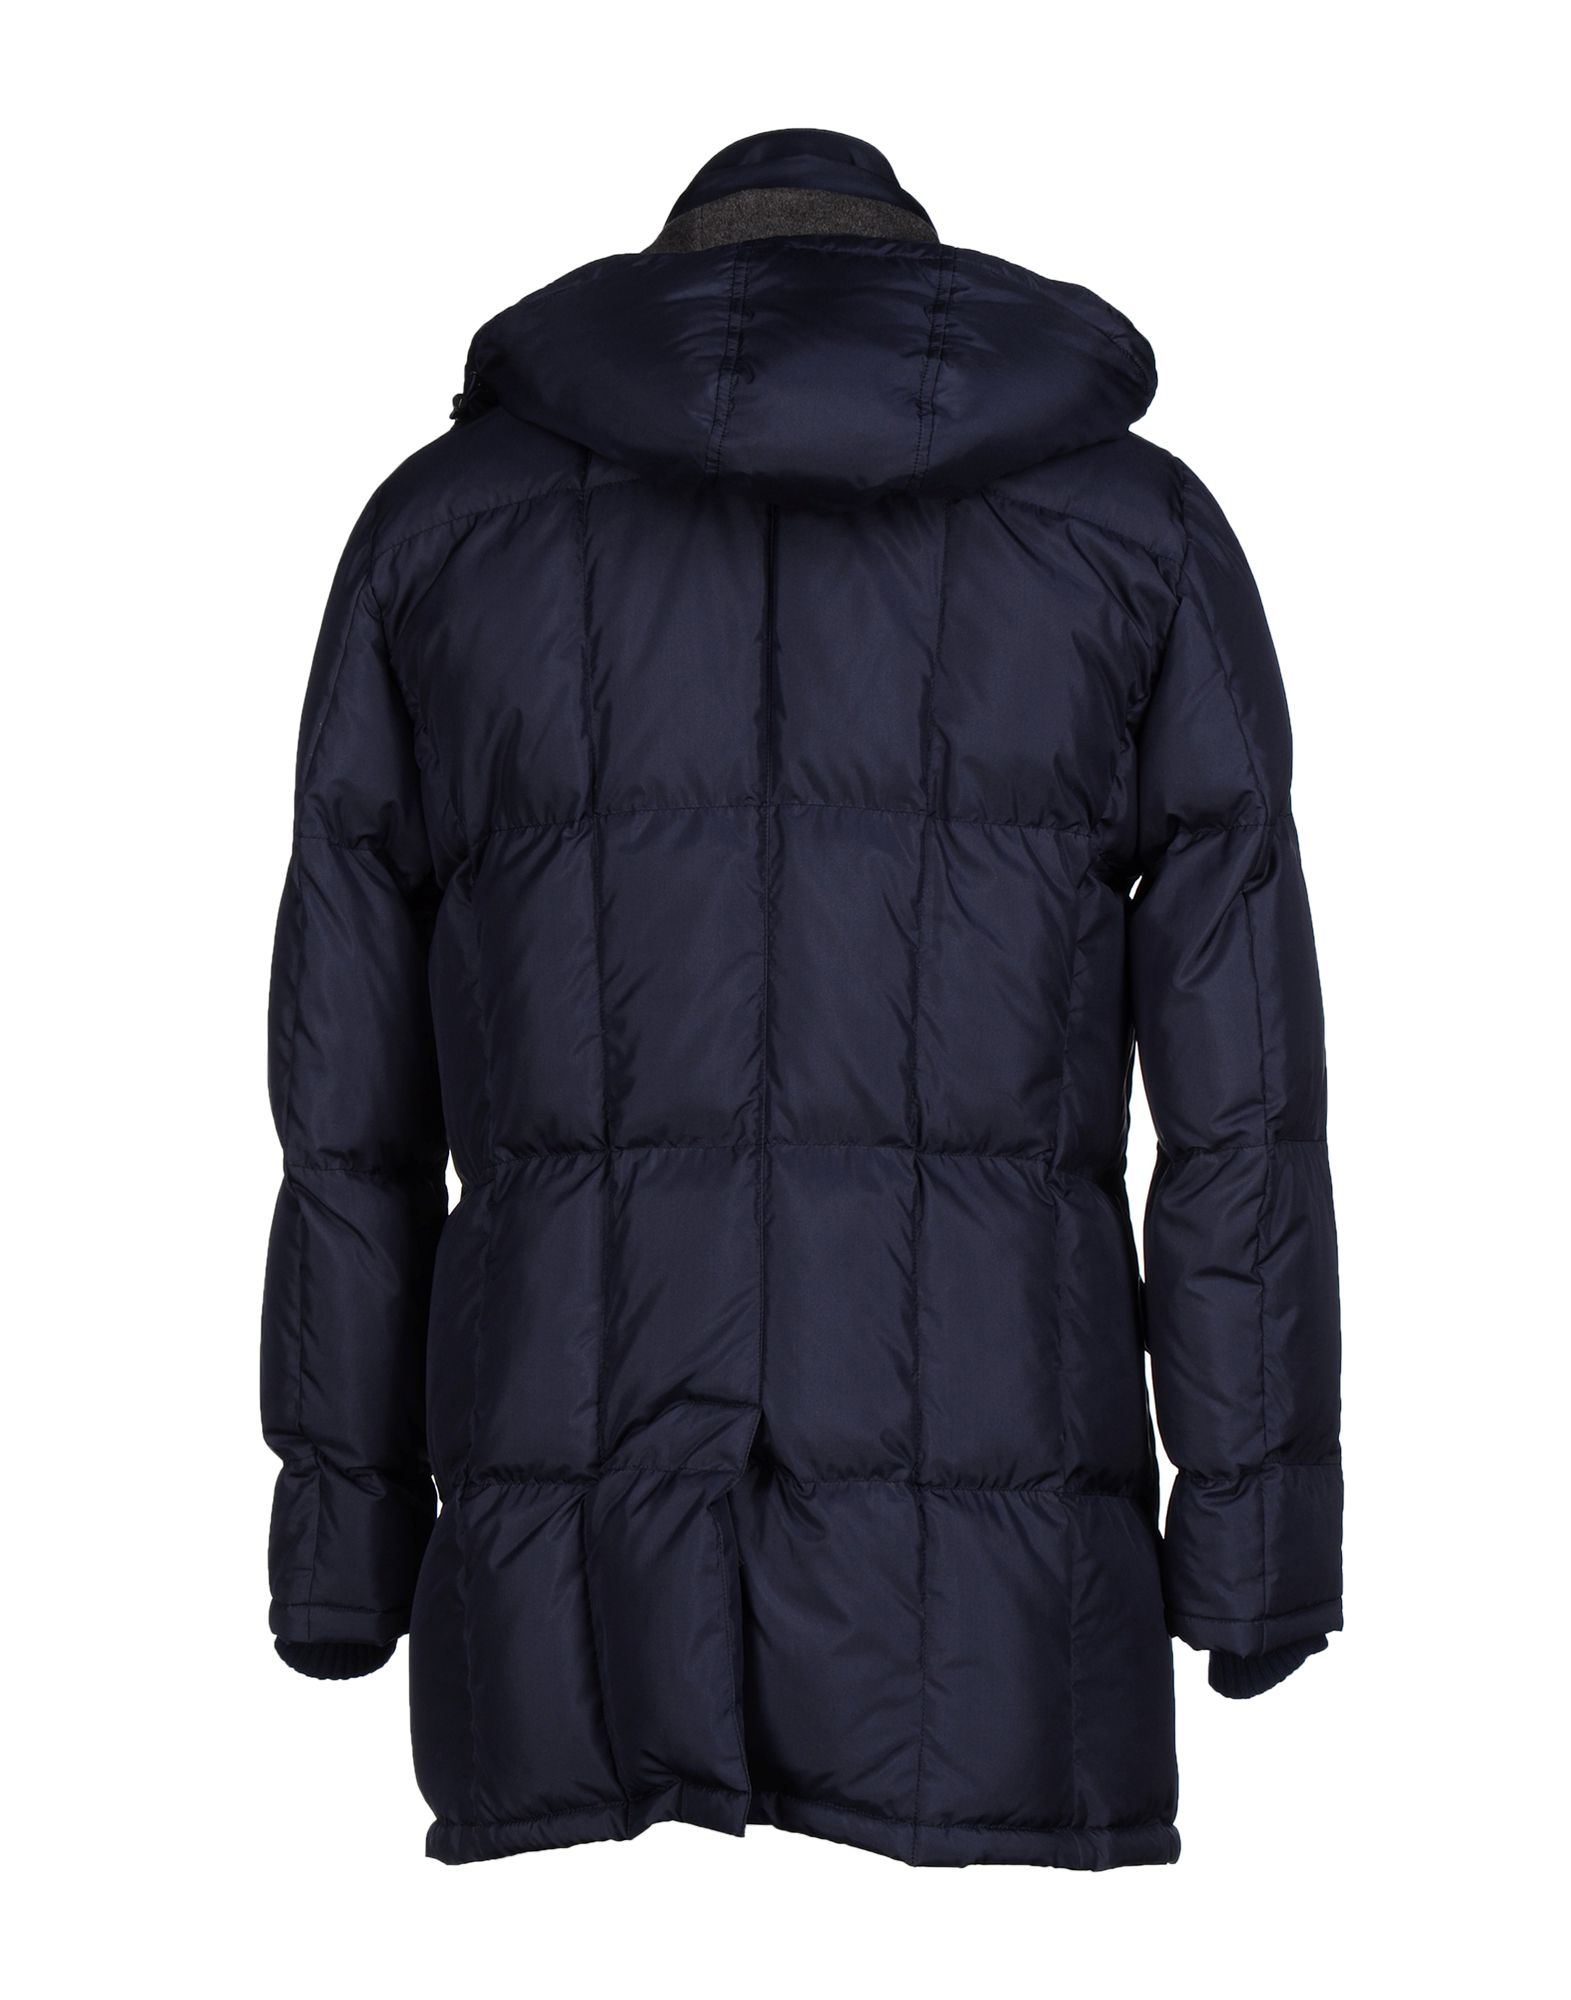 Cesare Attolini Goose Down Jacket in Dark Blue (Blue) for Men